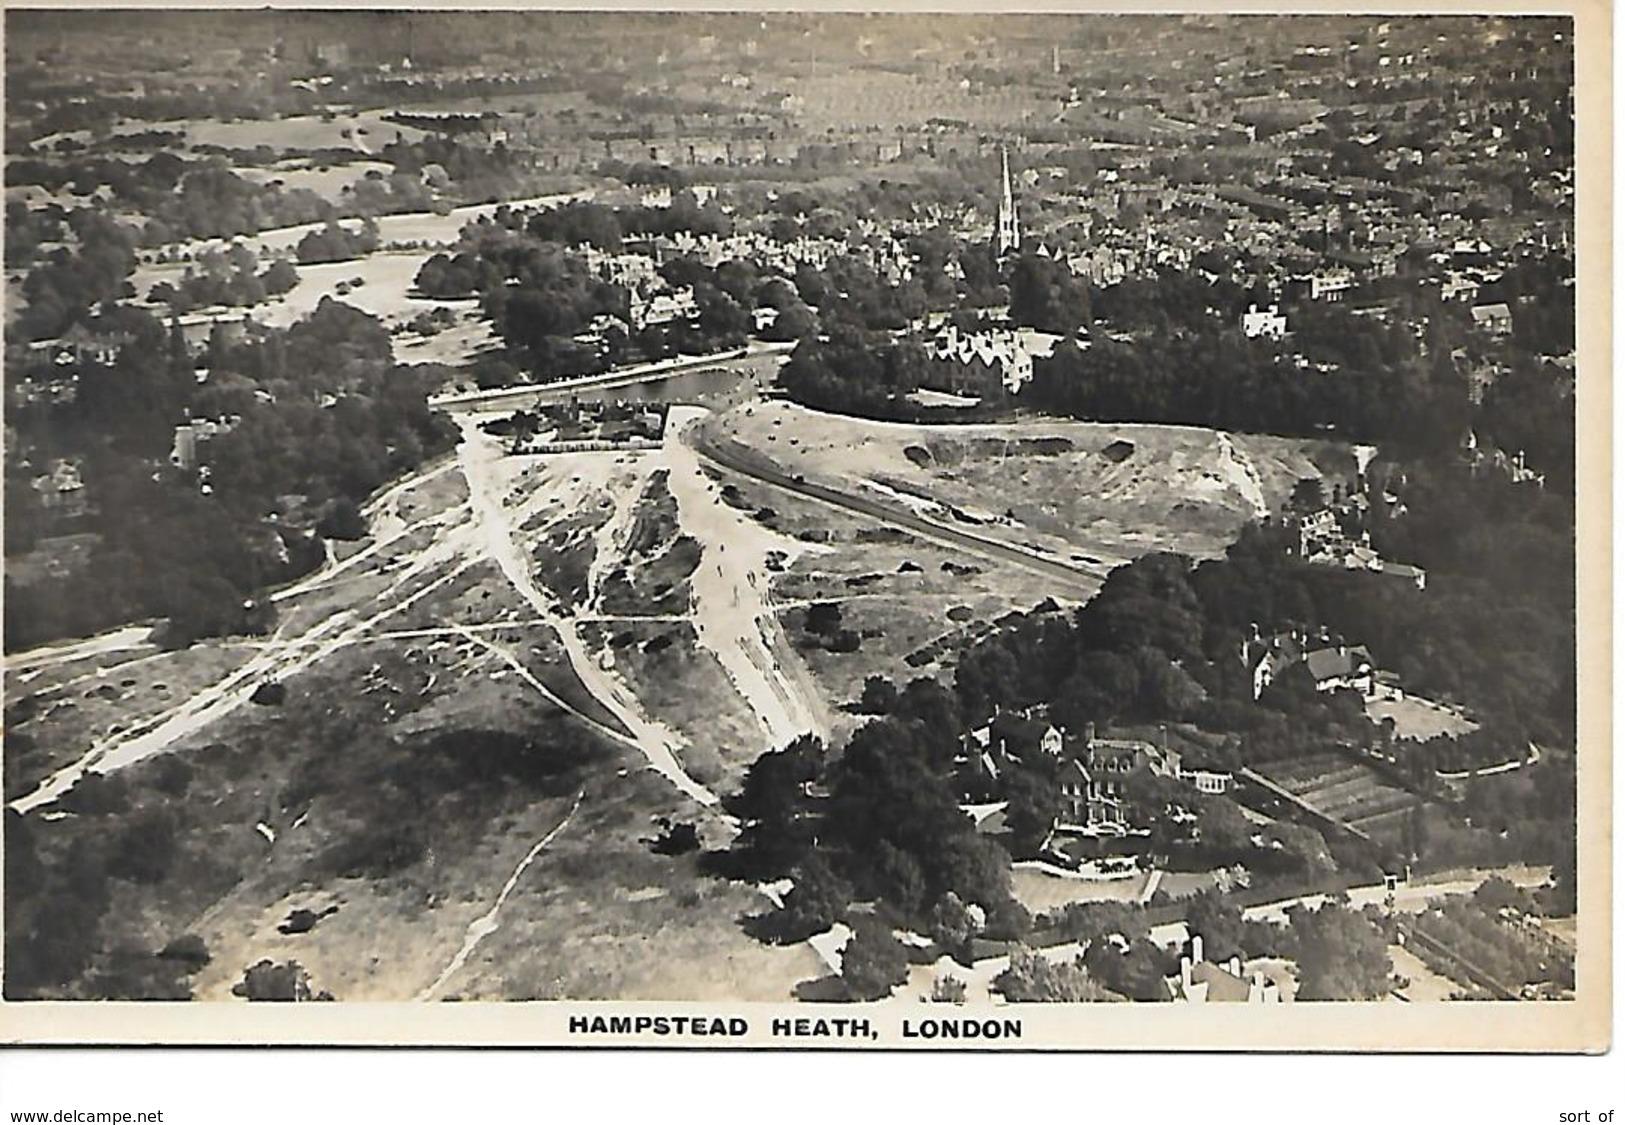 REAL PHOTO - HAMPSTEAD HEATH - AERIAL VIEW  - B9 - London Suburbs